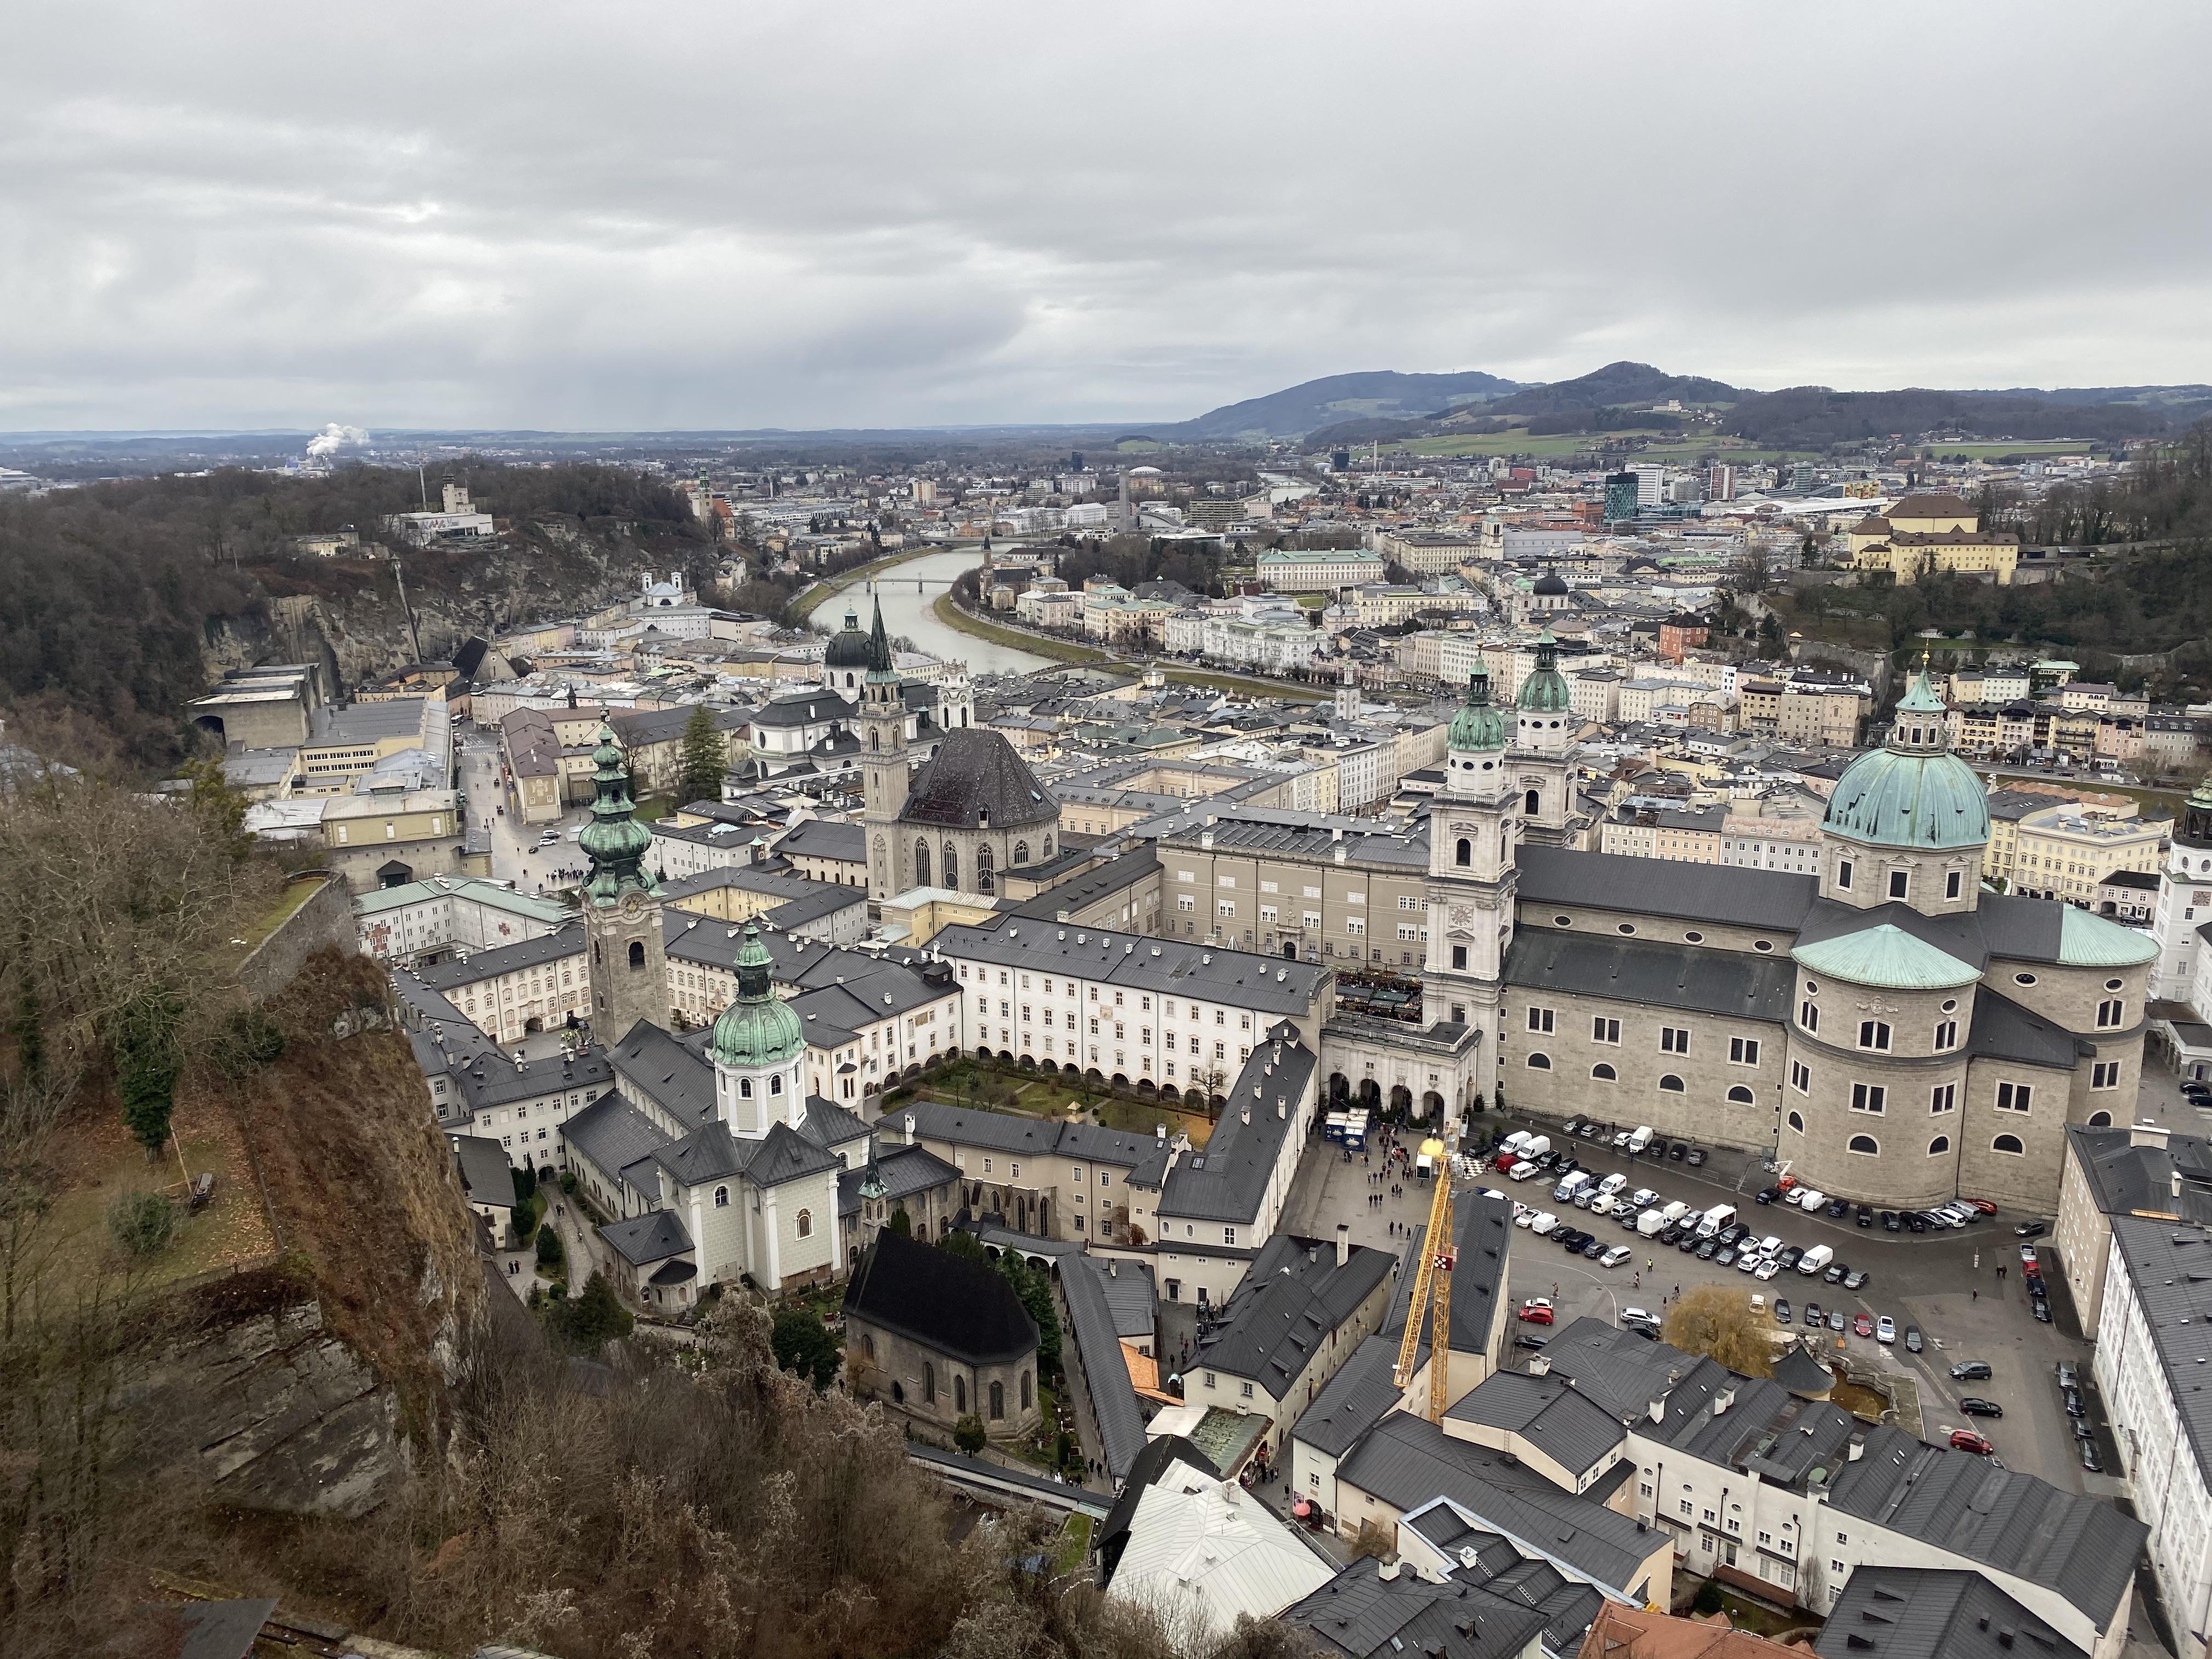 Views over Salzburg from Hohensalzburg Fortress.